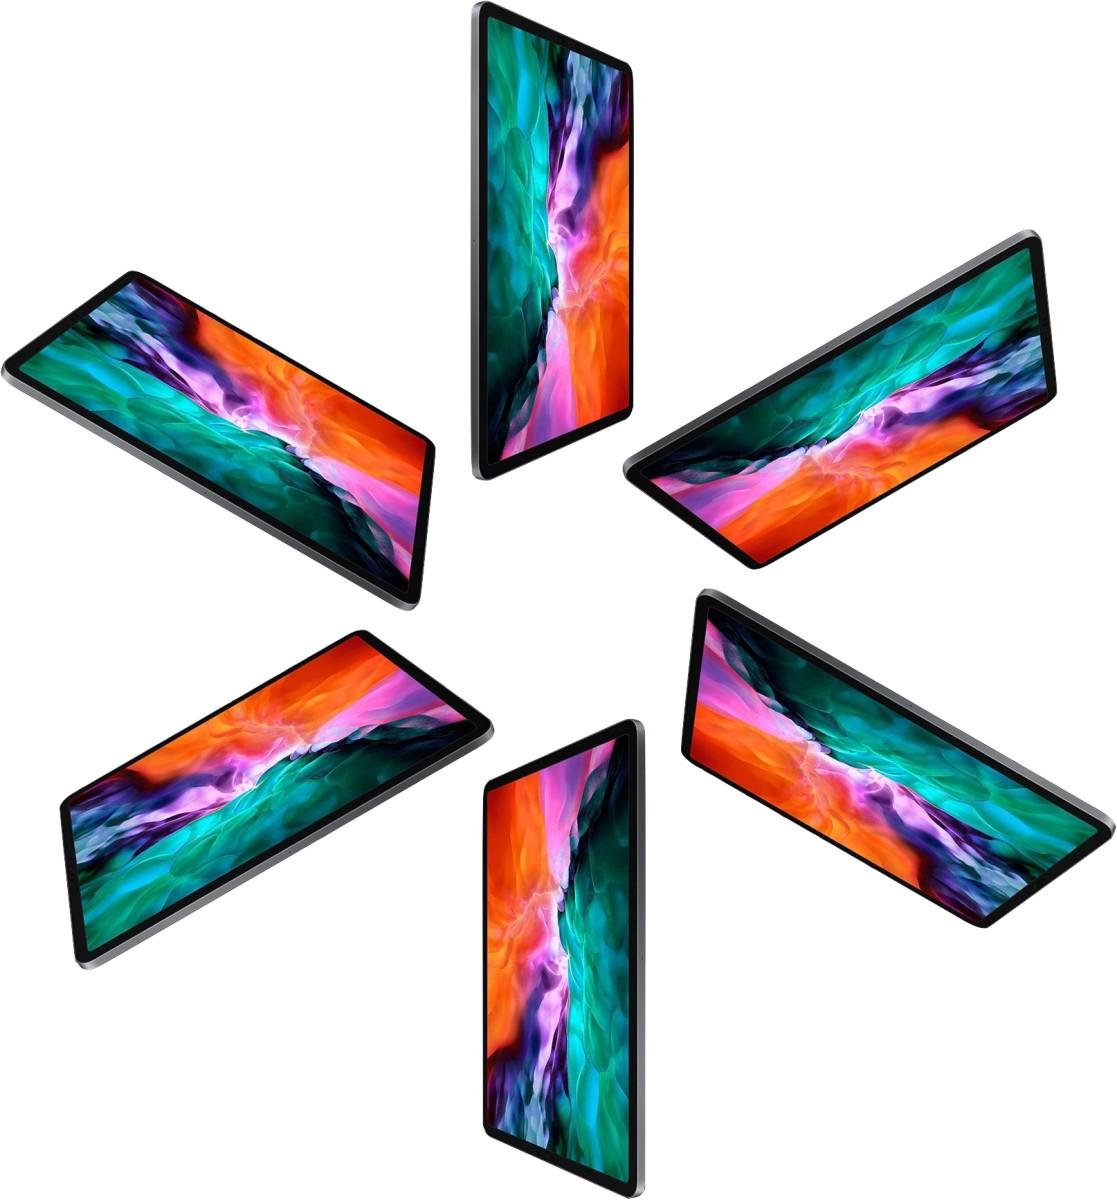 bf-offer-snowflake-ipad-202011